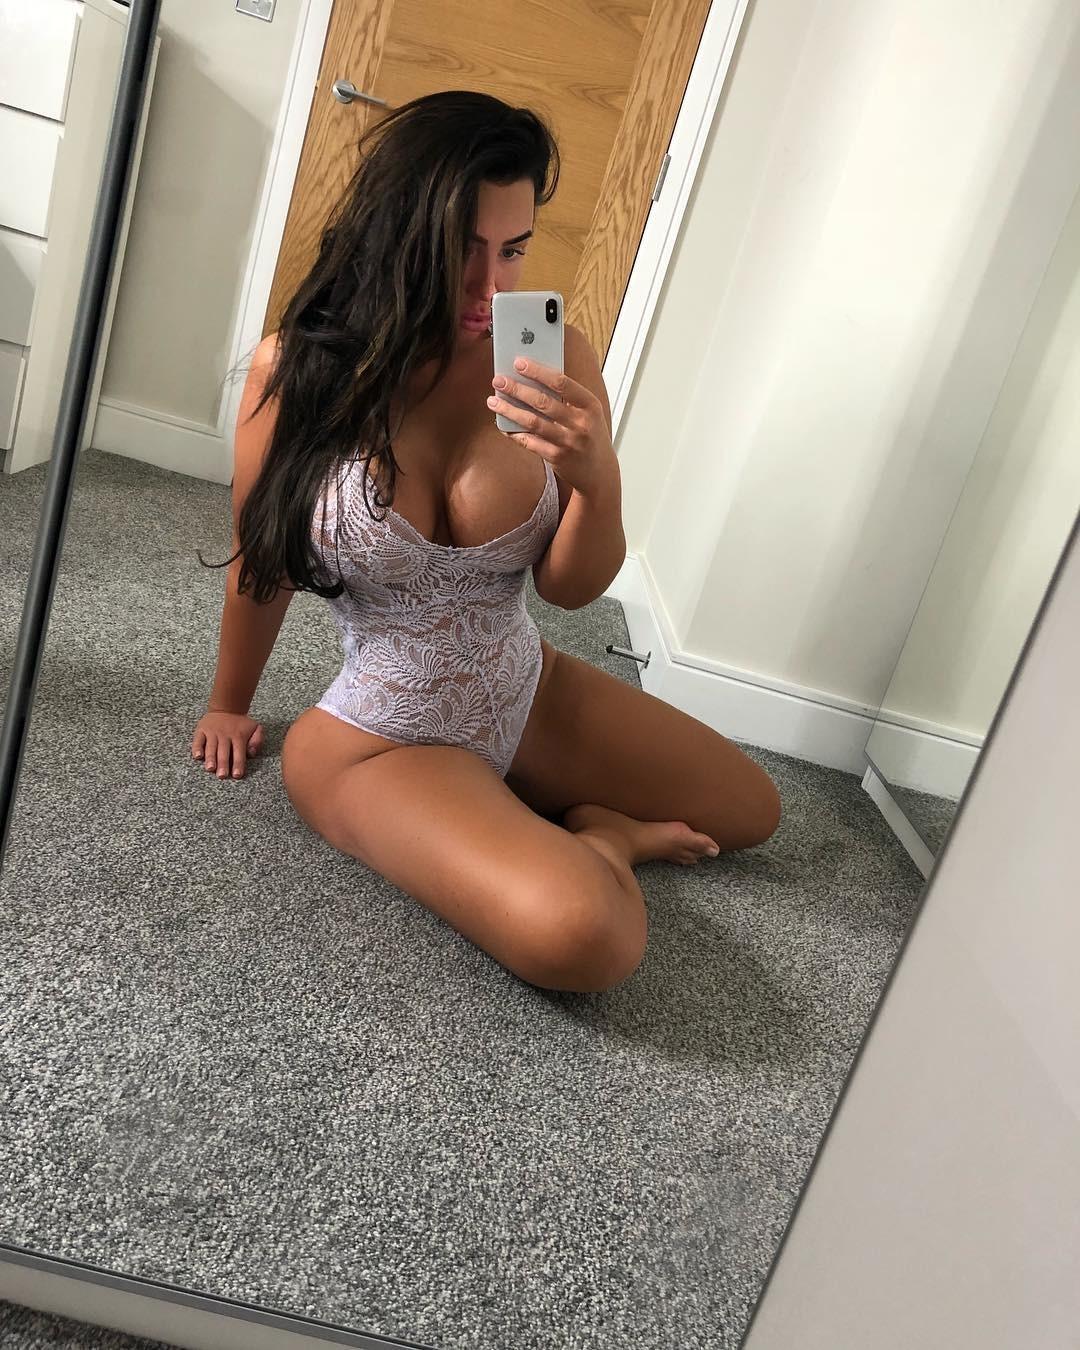 Lauren Goodger Leaked Blowjobs Pictures